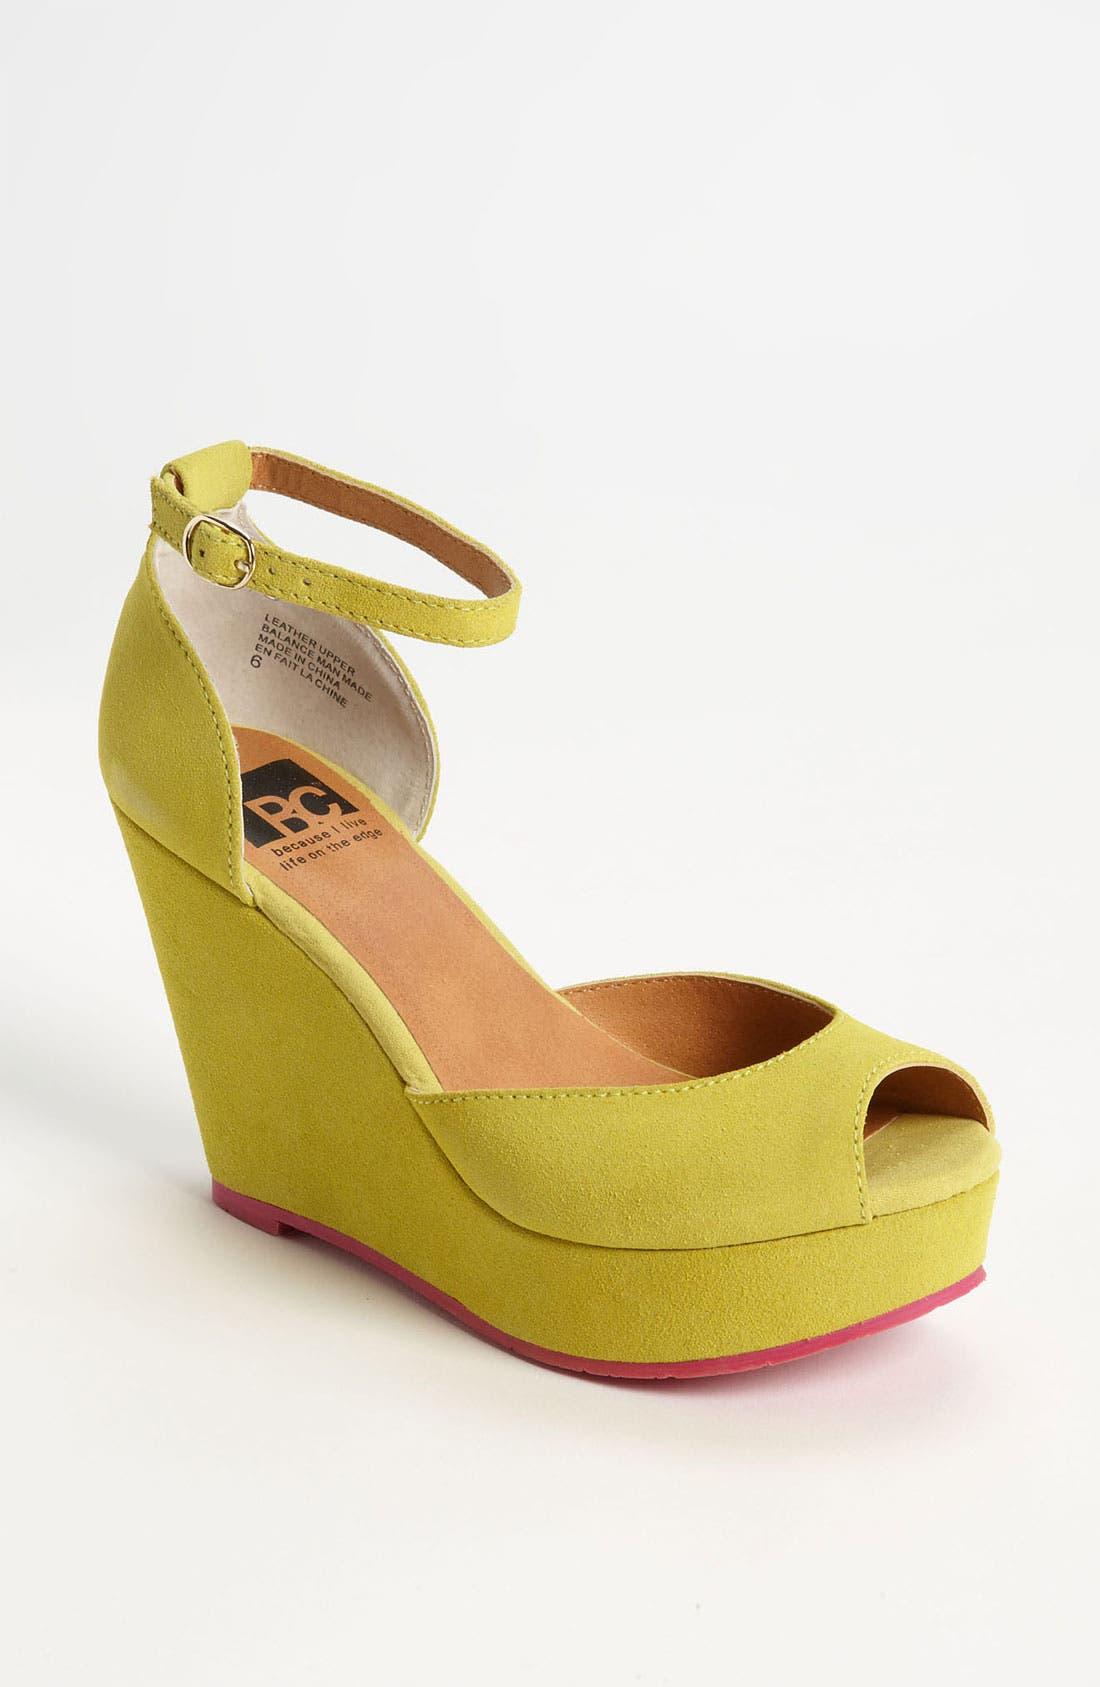 Main Image - BC Footwear 'Bright Idea' Wedge Sandal